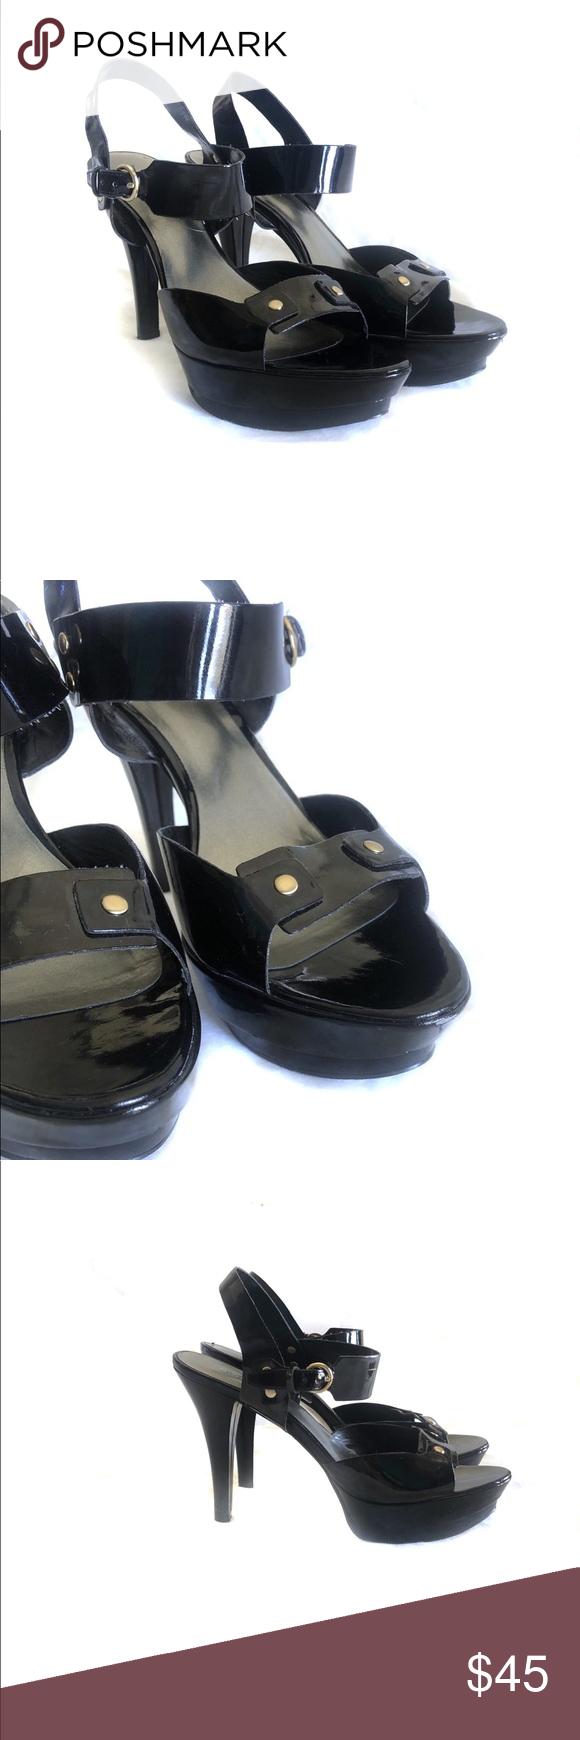 Nine West Black Patent Leather Platform Sandal 8 5 Leather Platform Sandals Black Patent Leather Black Patent